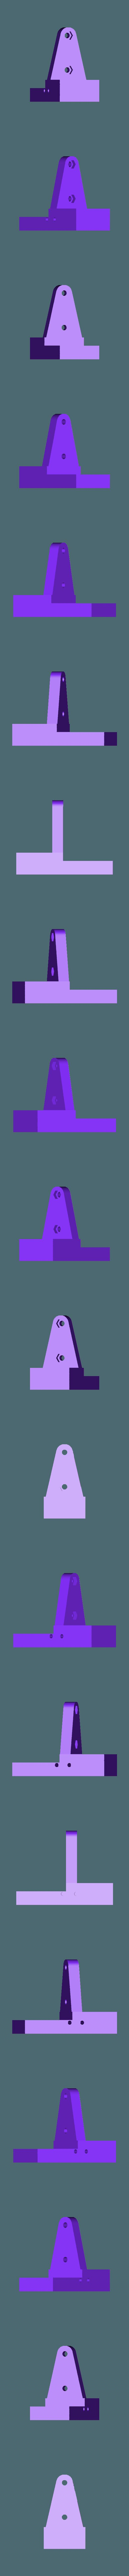 selector_v41_selector_v41_end_1_Body1_end.stl Télécharger fichier STL gratuit Plasma Cutter plotter CNC • Modèle à imprimer en 3D, TinkersProjects